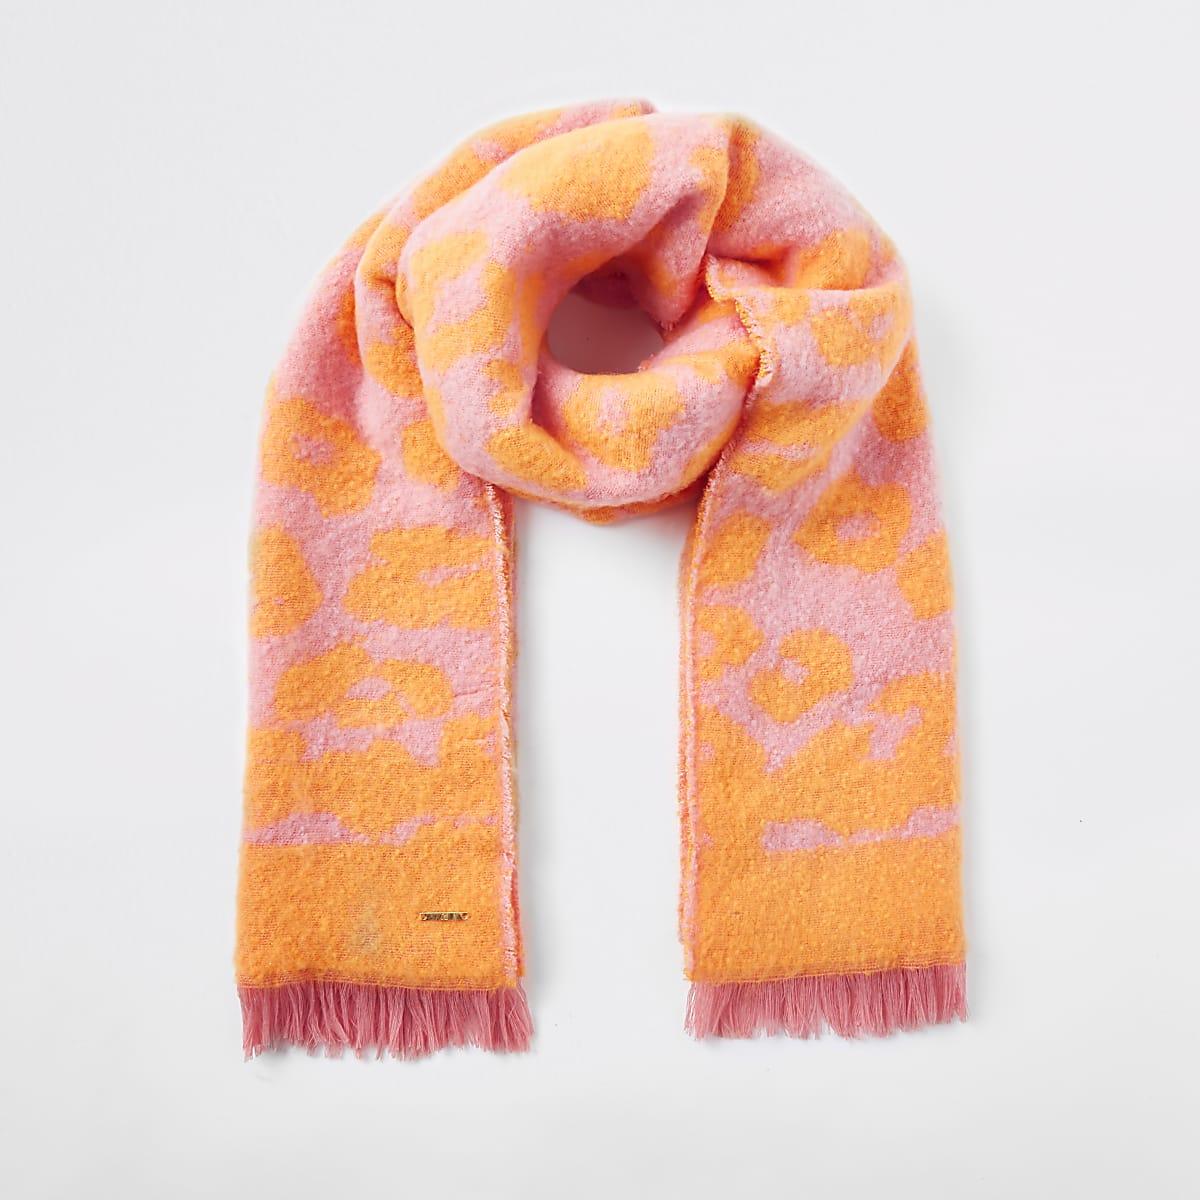 Sjaal in oranje en koraalrood met luipaardprint